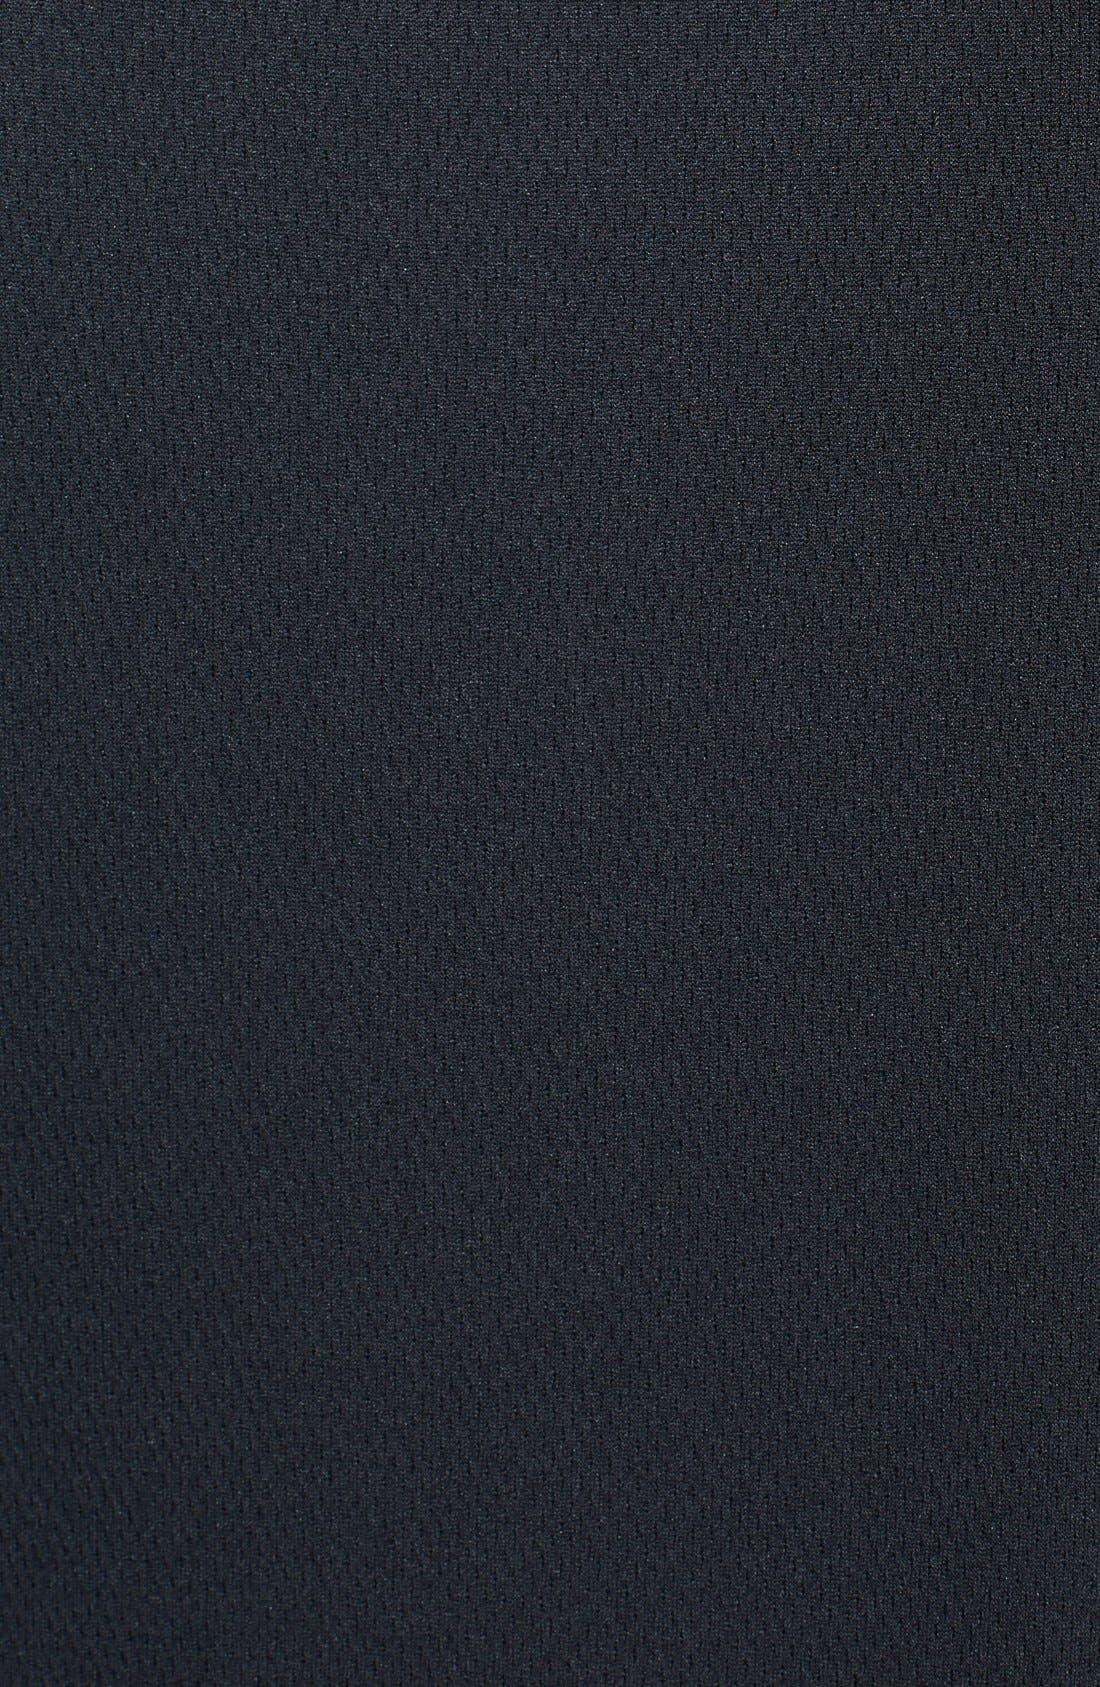 Cincinnati Bengals - Edge DryTec Moisture Wicking Half Zip Pullover,                             Alternate thumbnail 3, color,                             001